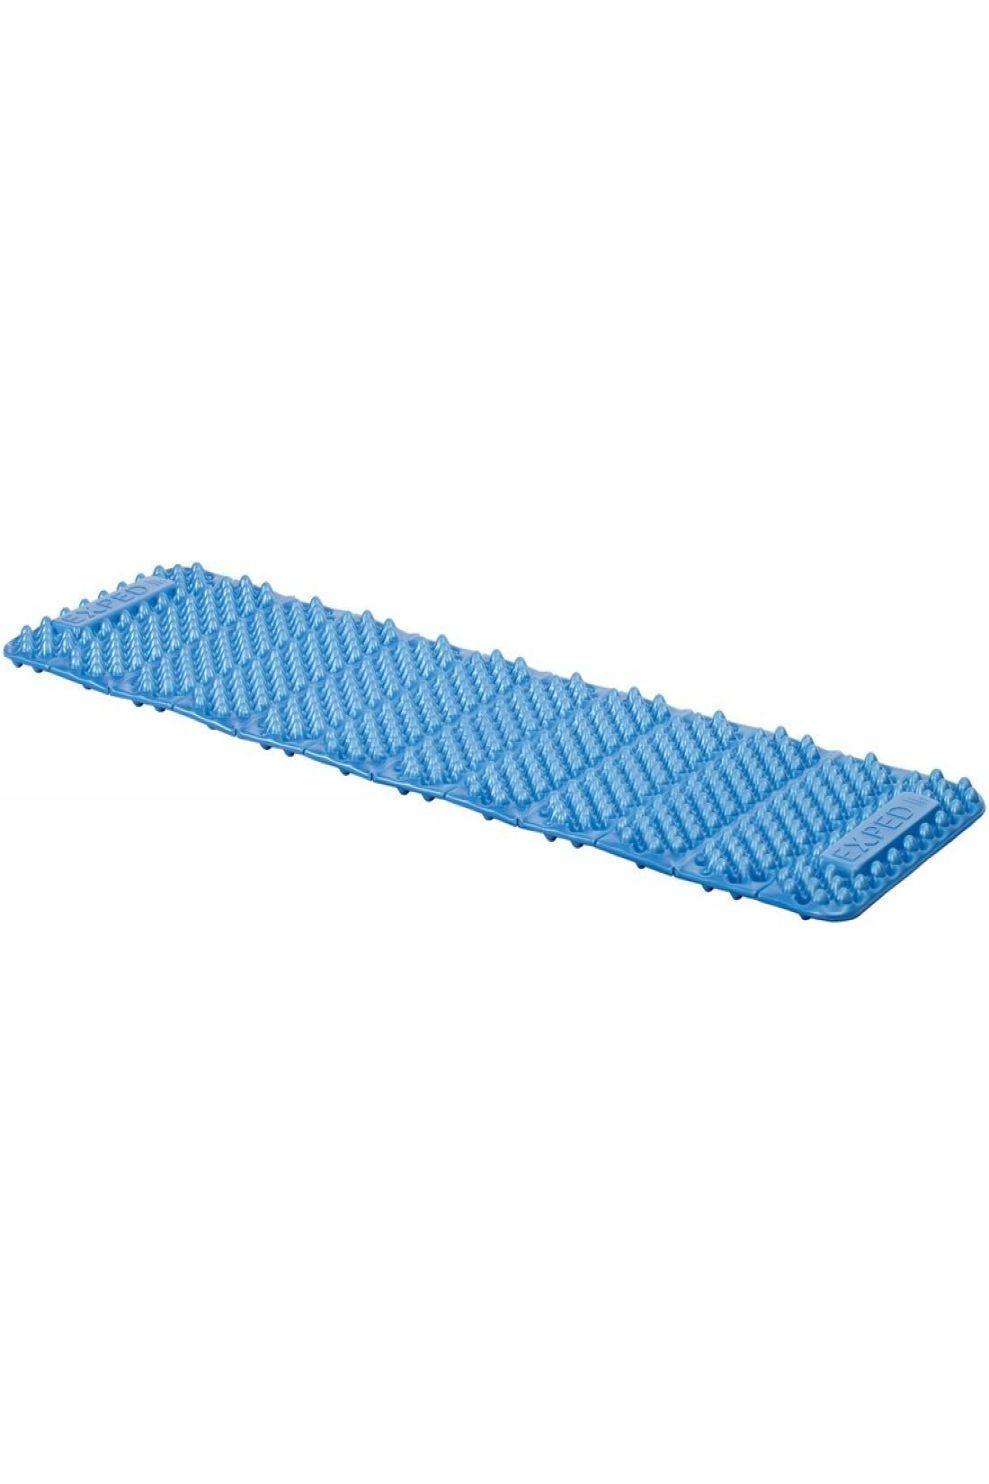 Exped Slaapmat Flexmat Plus XS - Blauw